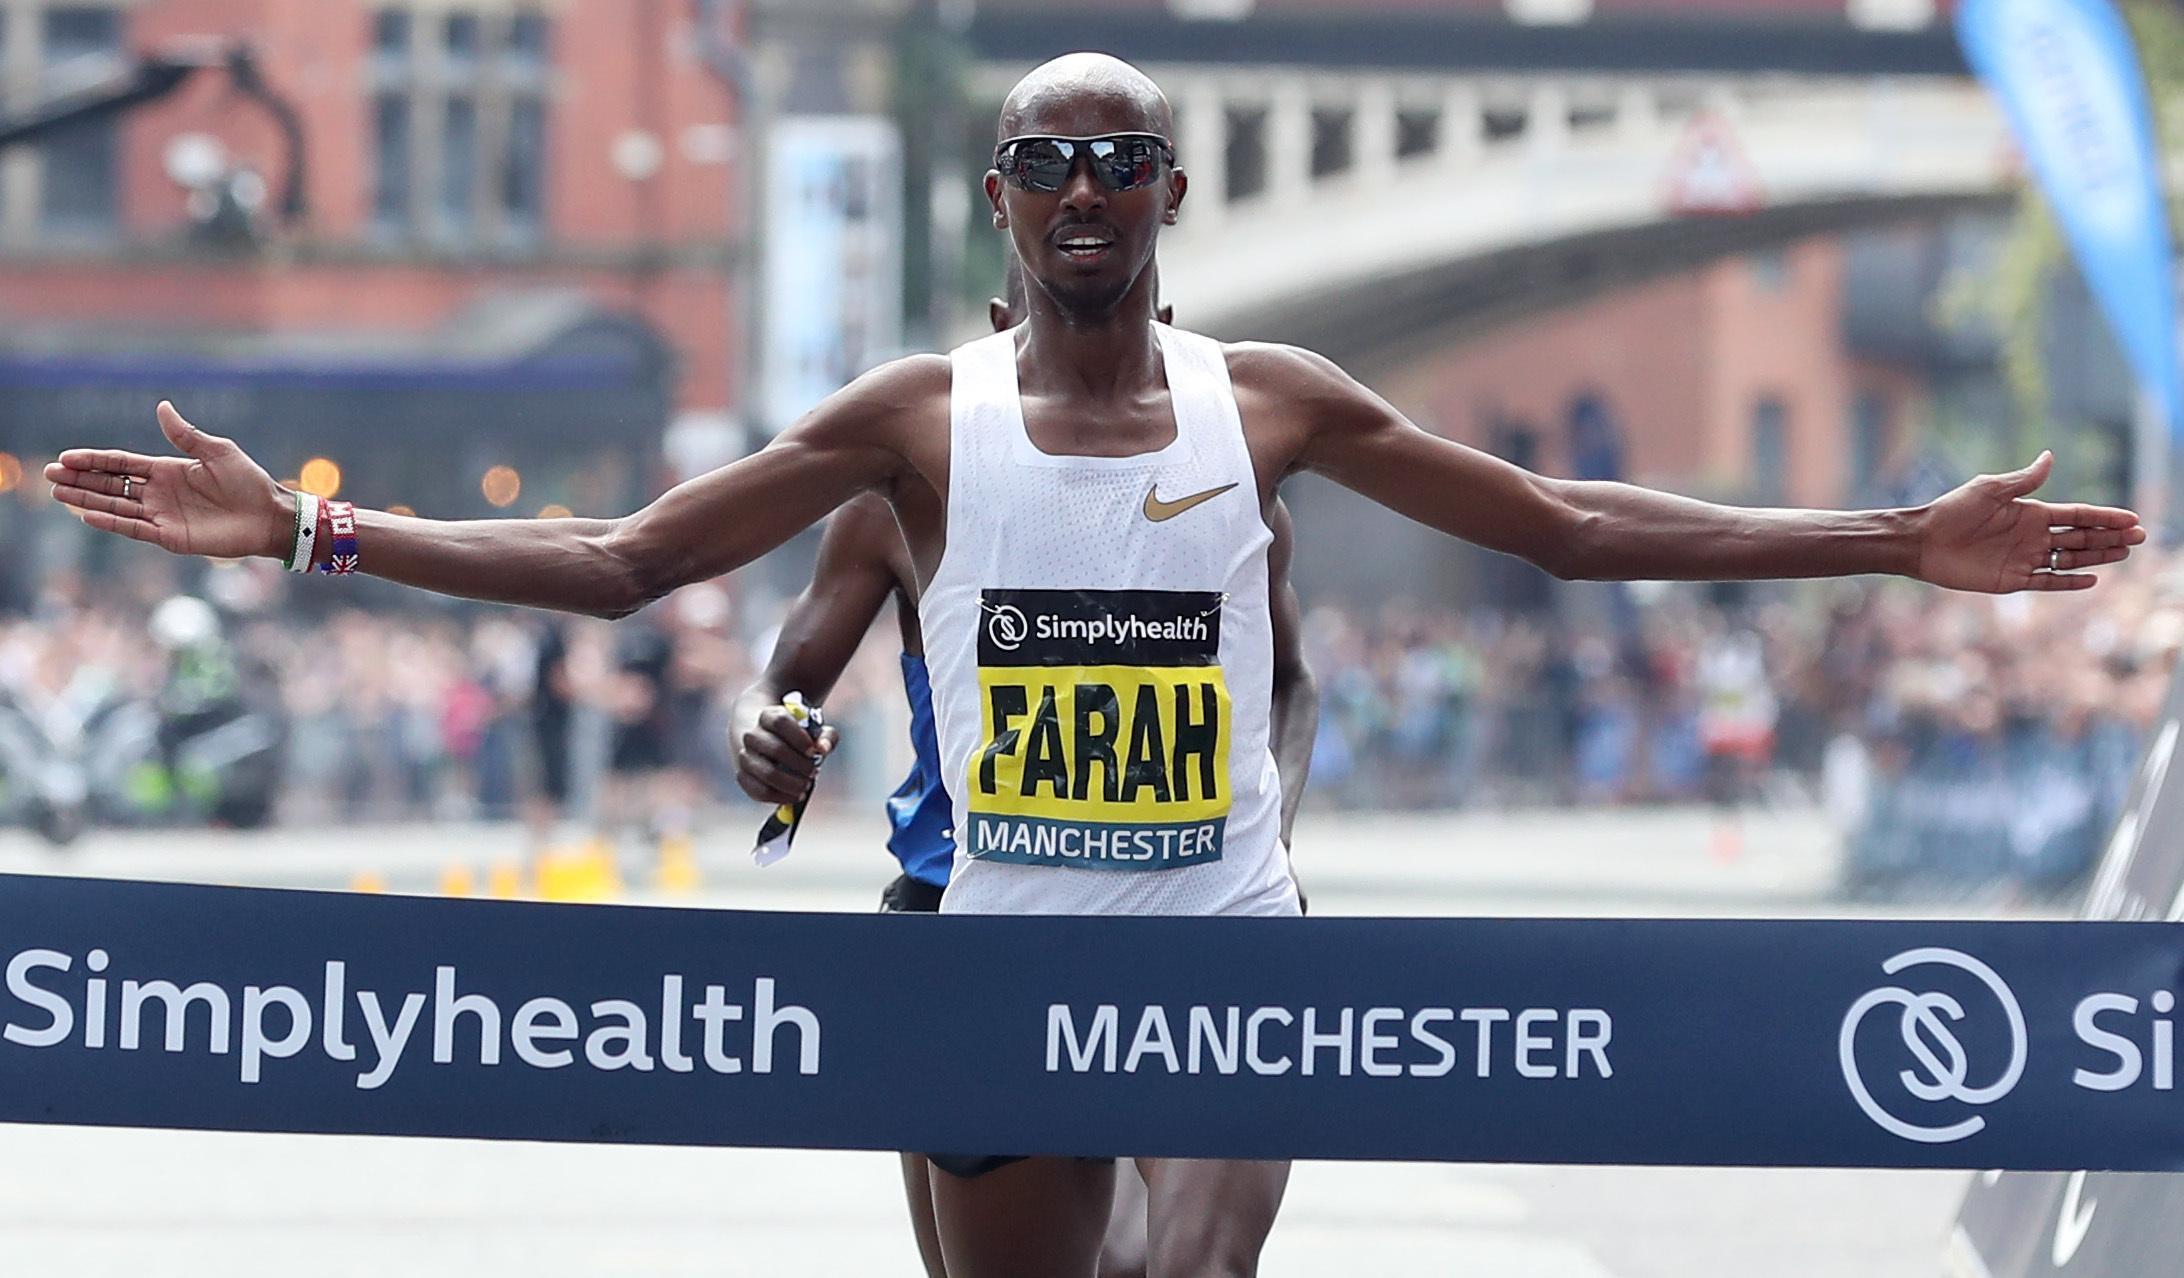 Callum Hawkins will face Olympic legend Mo Farah